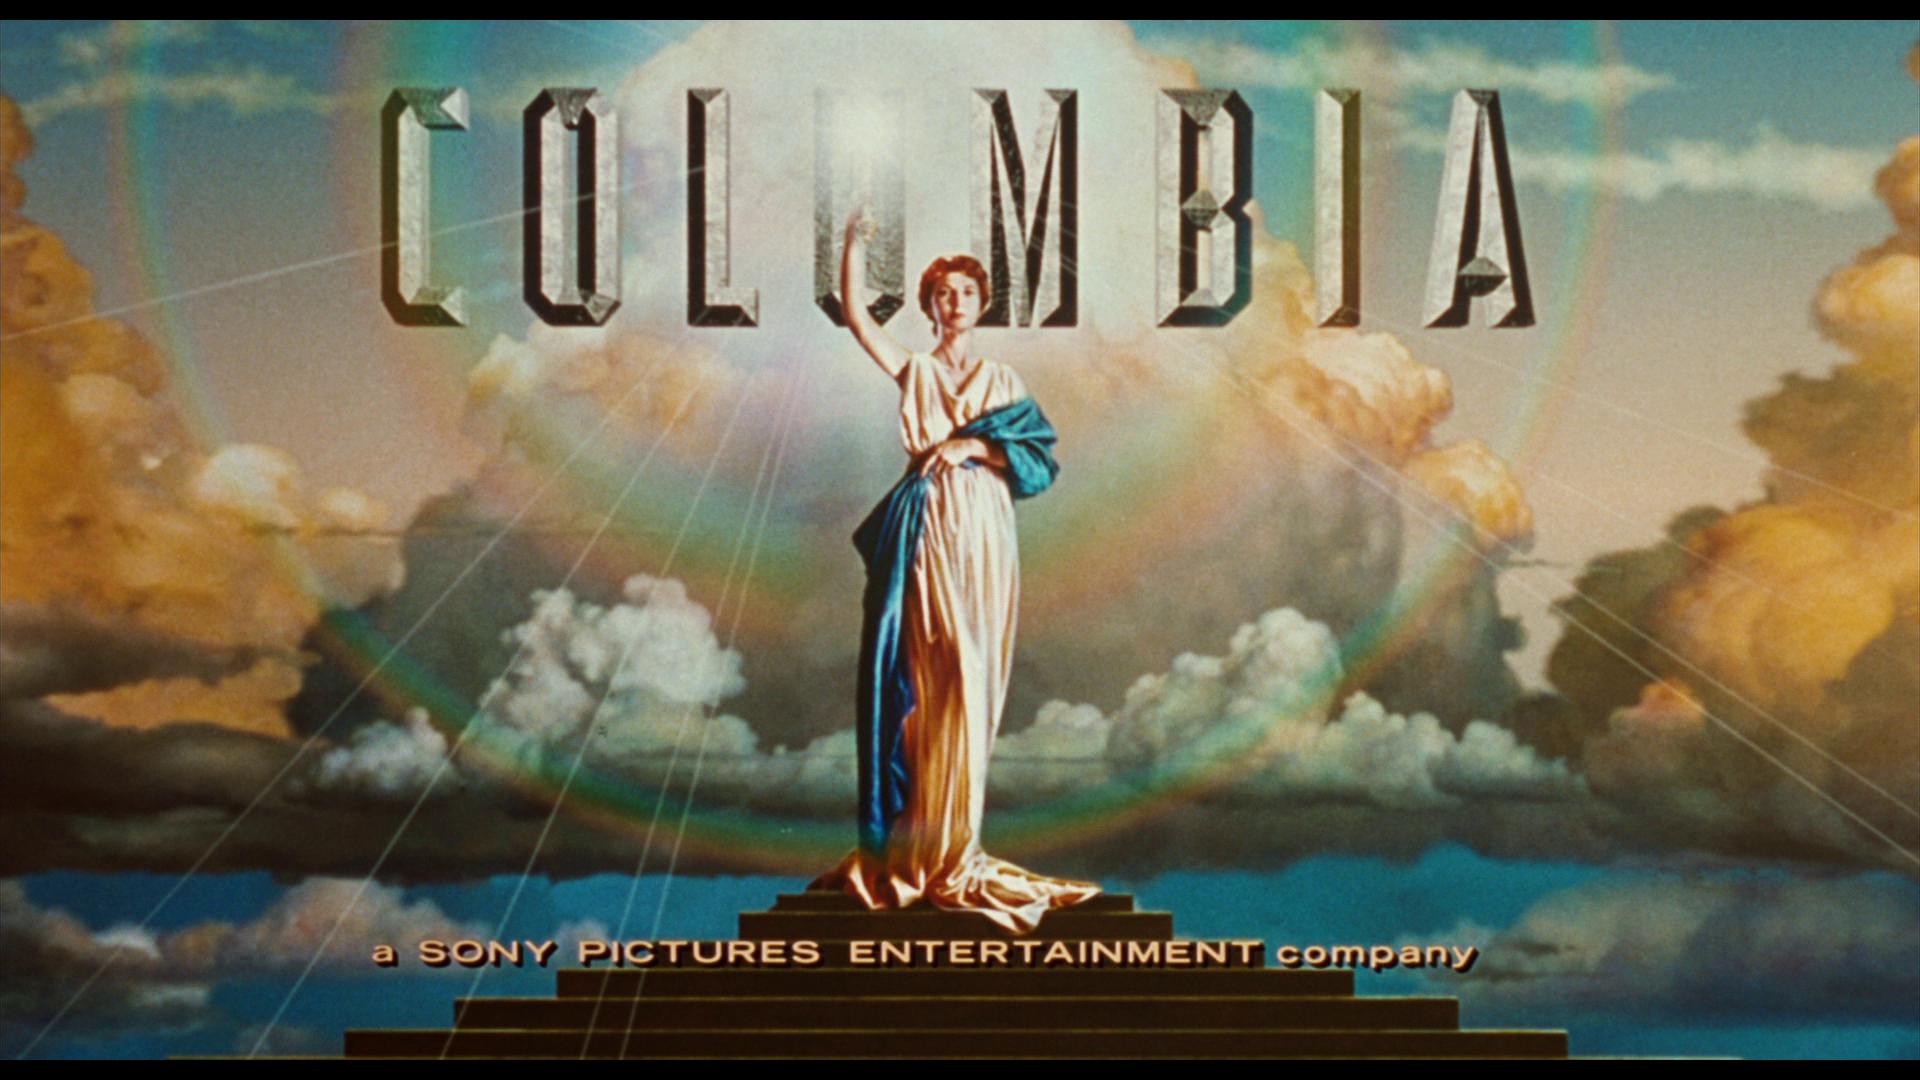 Casino columbia, columbia transport gambling hall las vegas